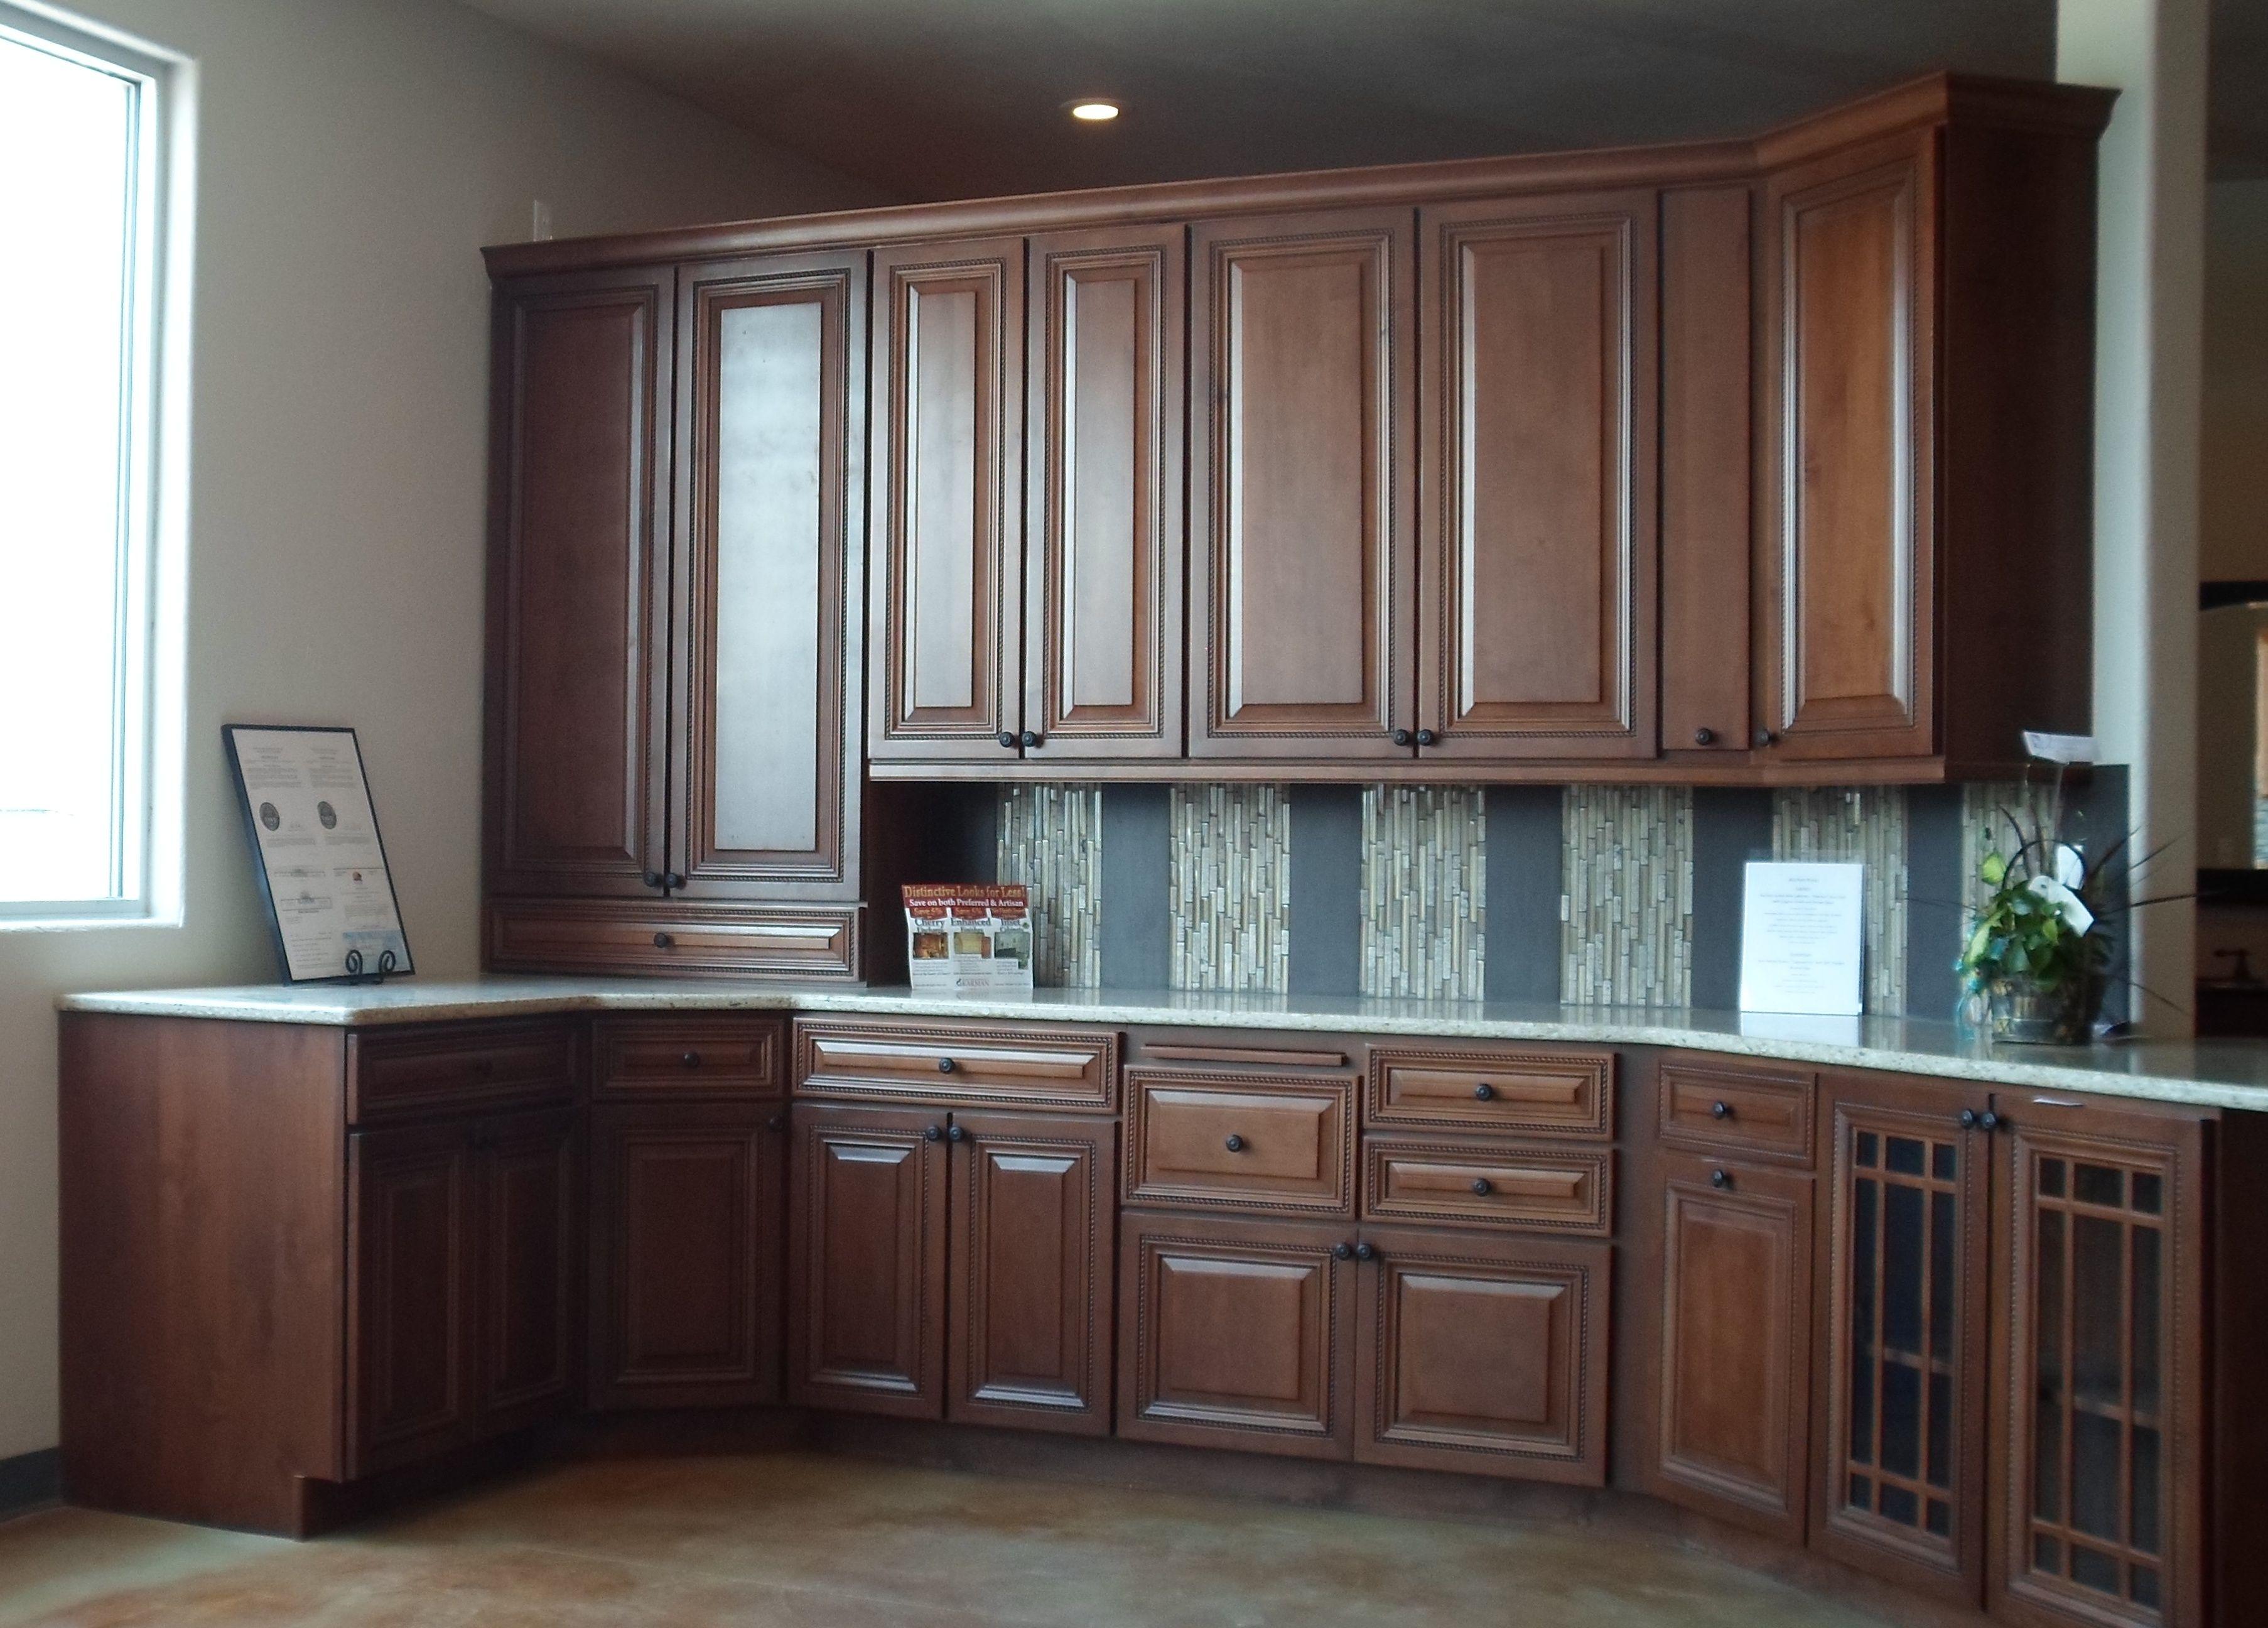 Karman Brand Alder Cabinets Stanton Door Style With Cognac Finish And Brown Glaze Kitchen Renovation Alder Cabinets Kitchen